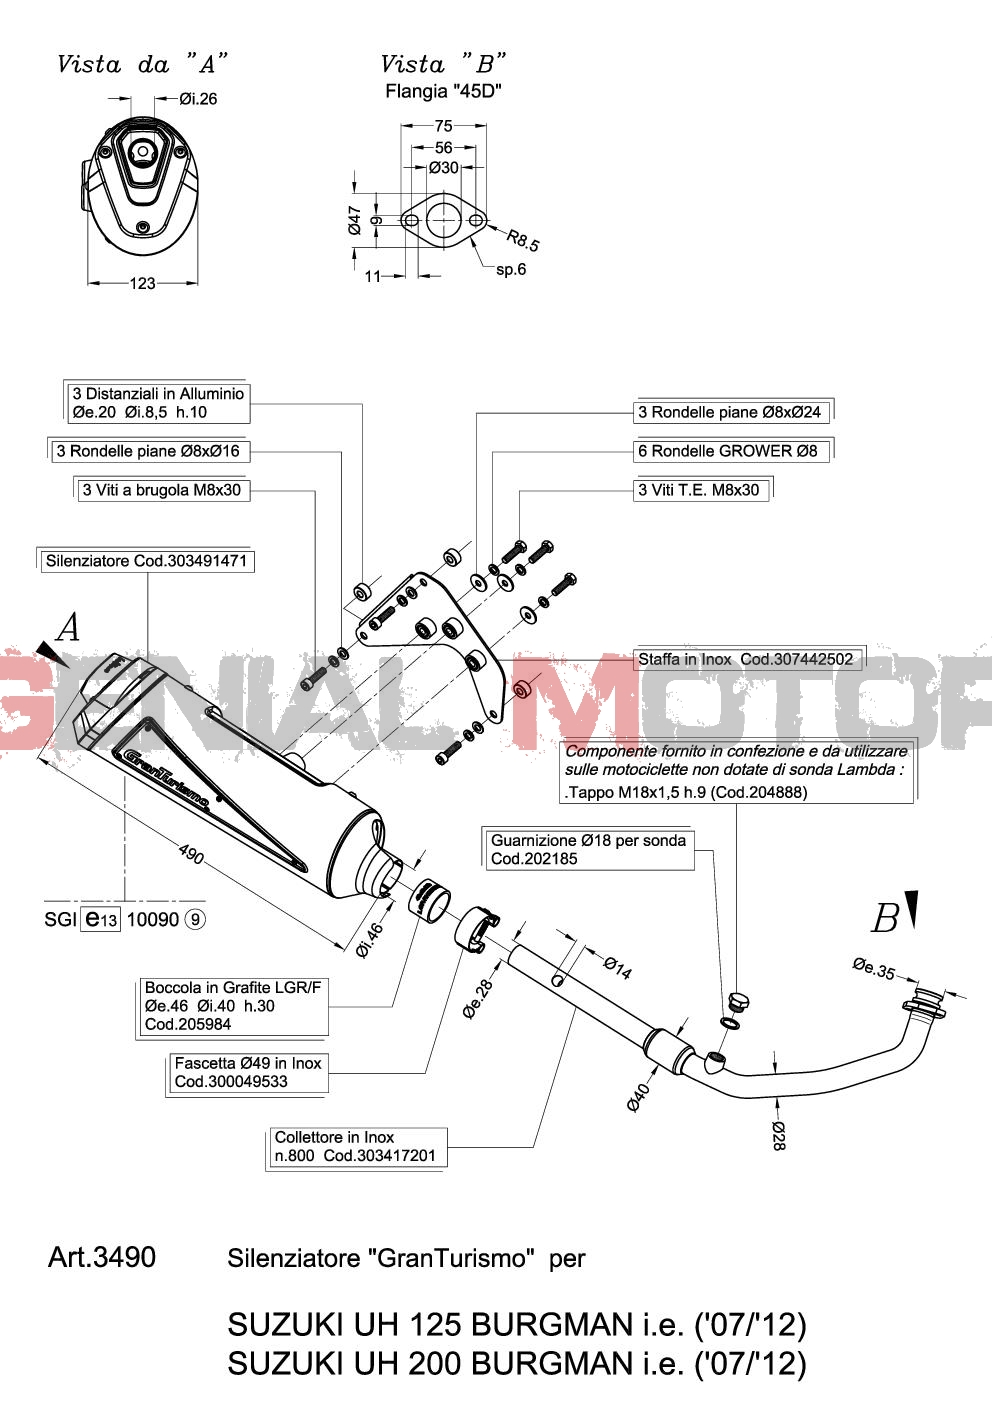 3490 Echappement Complete Leovince Granturismo Suzuki Uh 200 Burgman 2007 > 2013